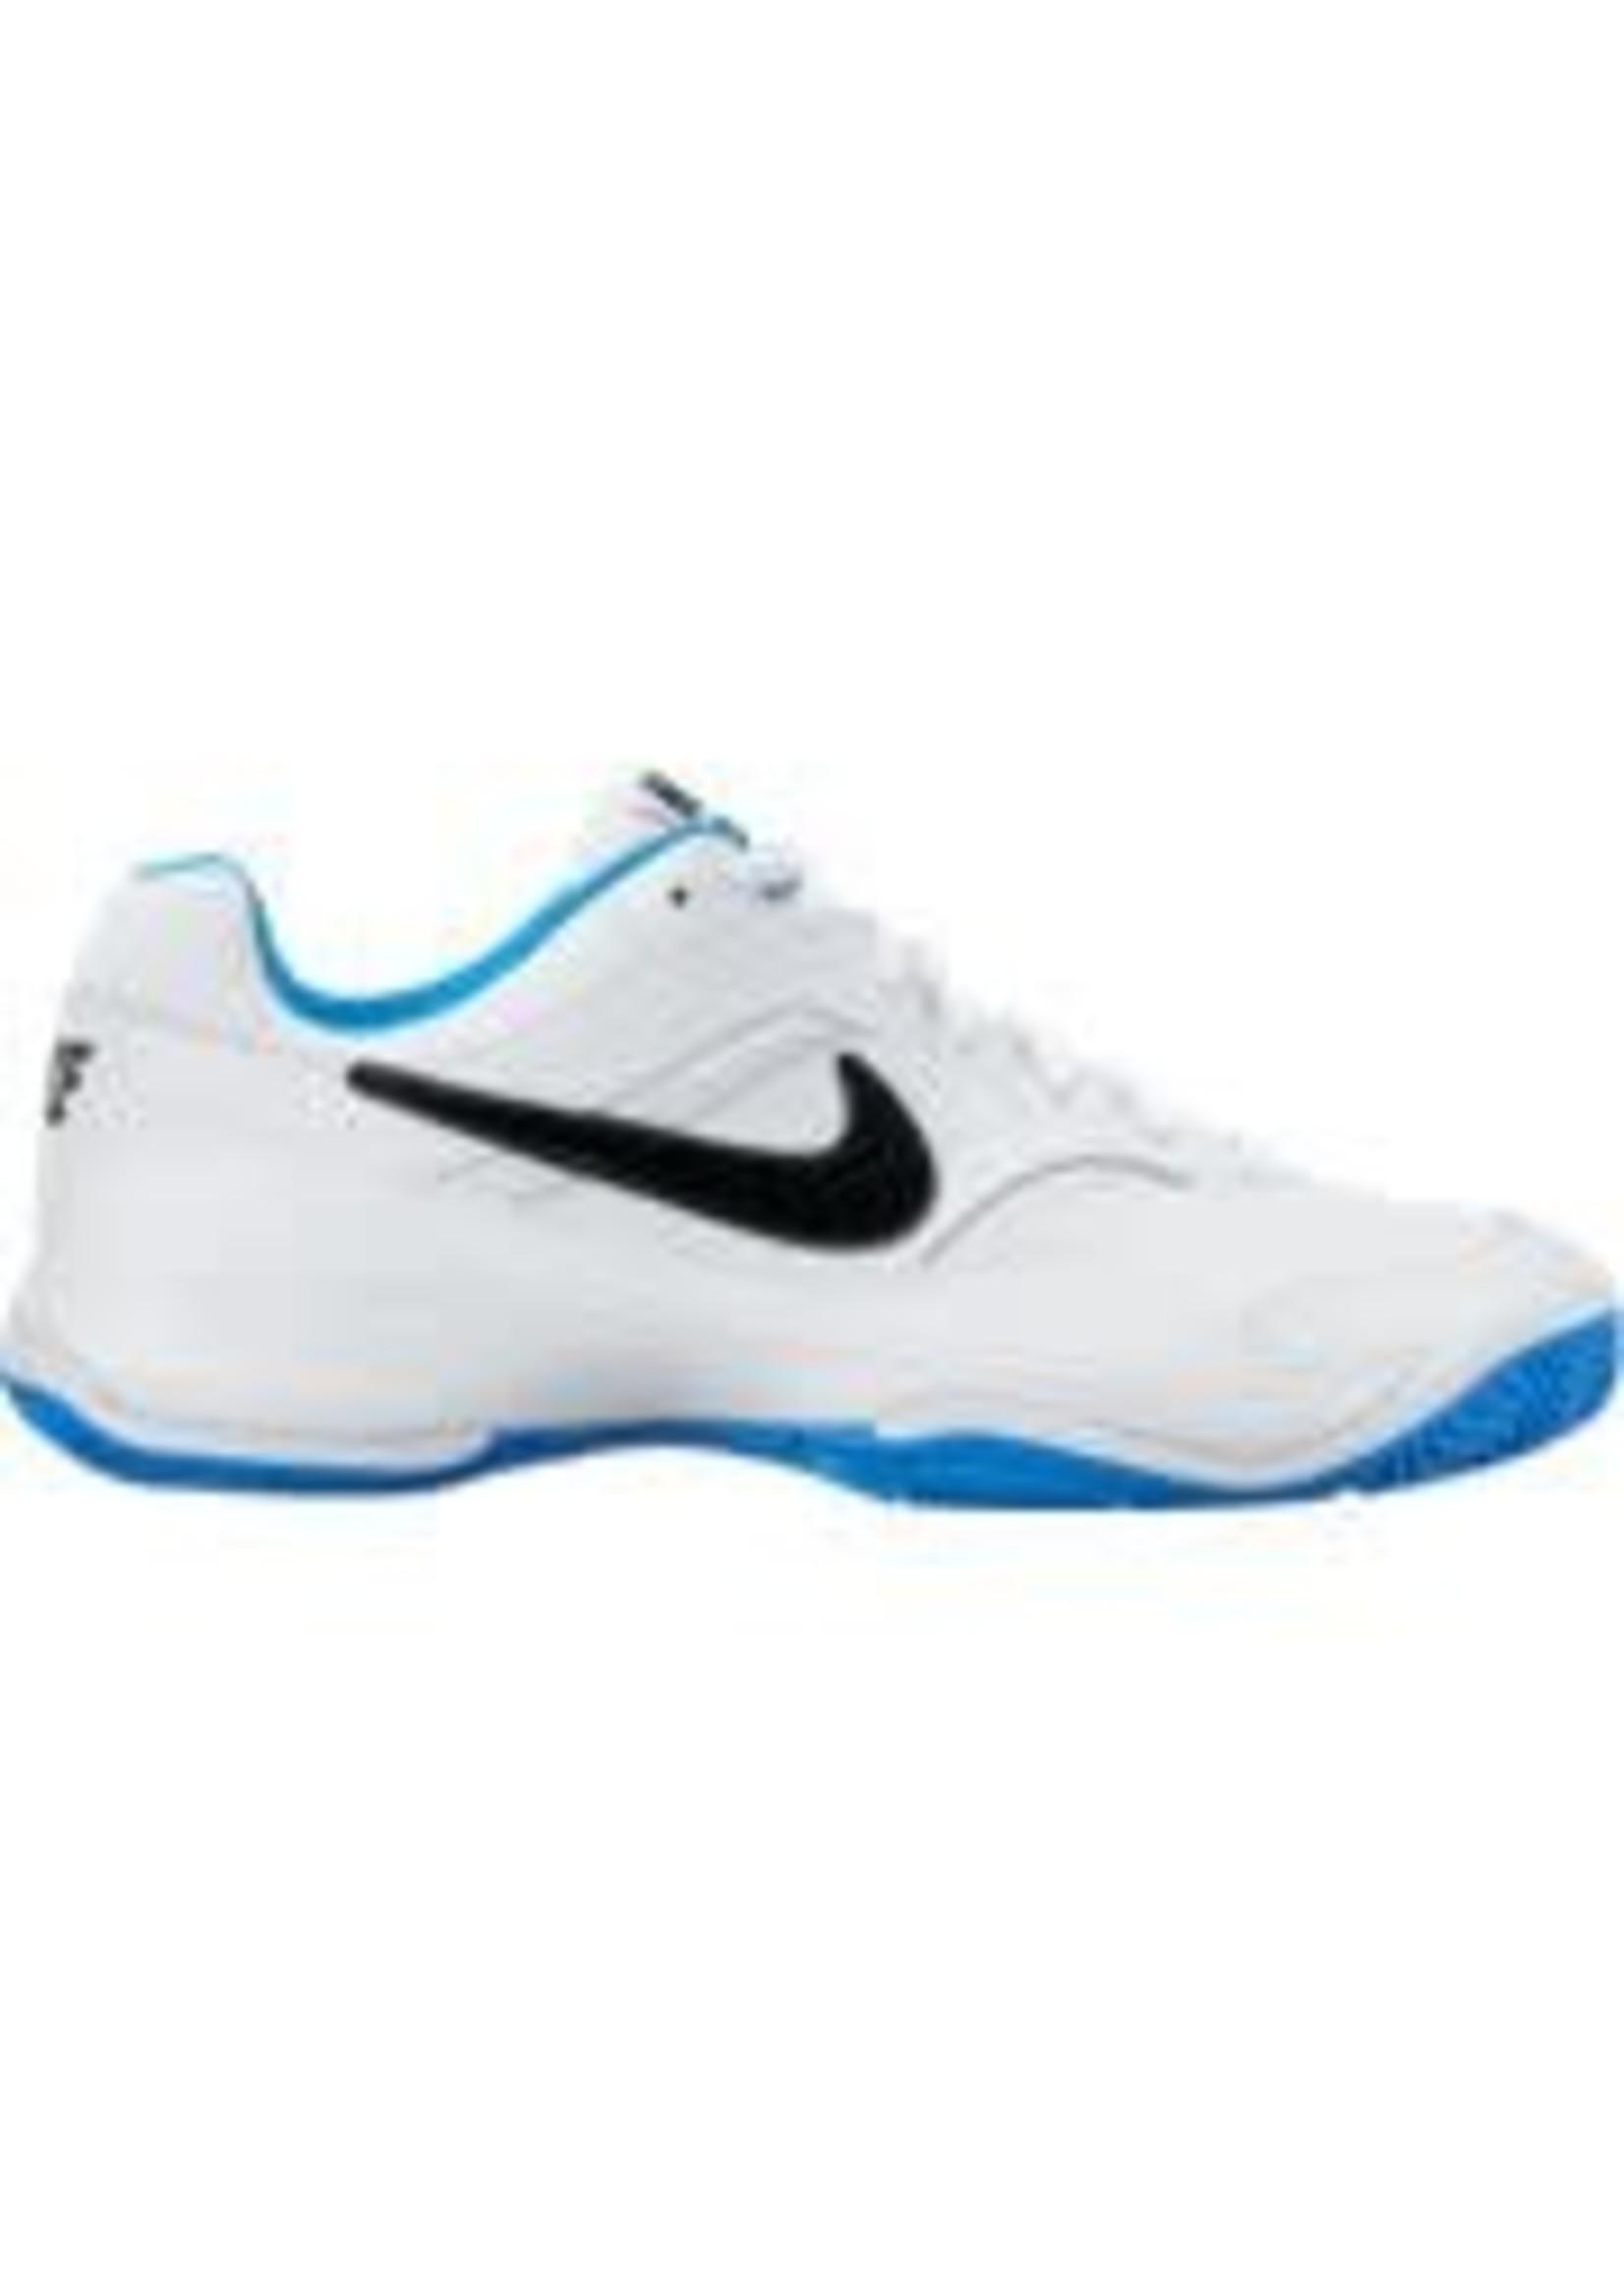 Nike Mens Court Lite Tennis Shoe White/Black/Blue 11